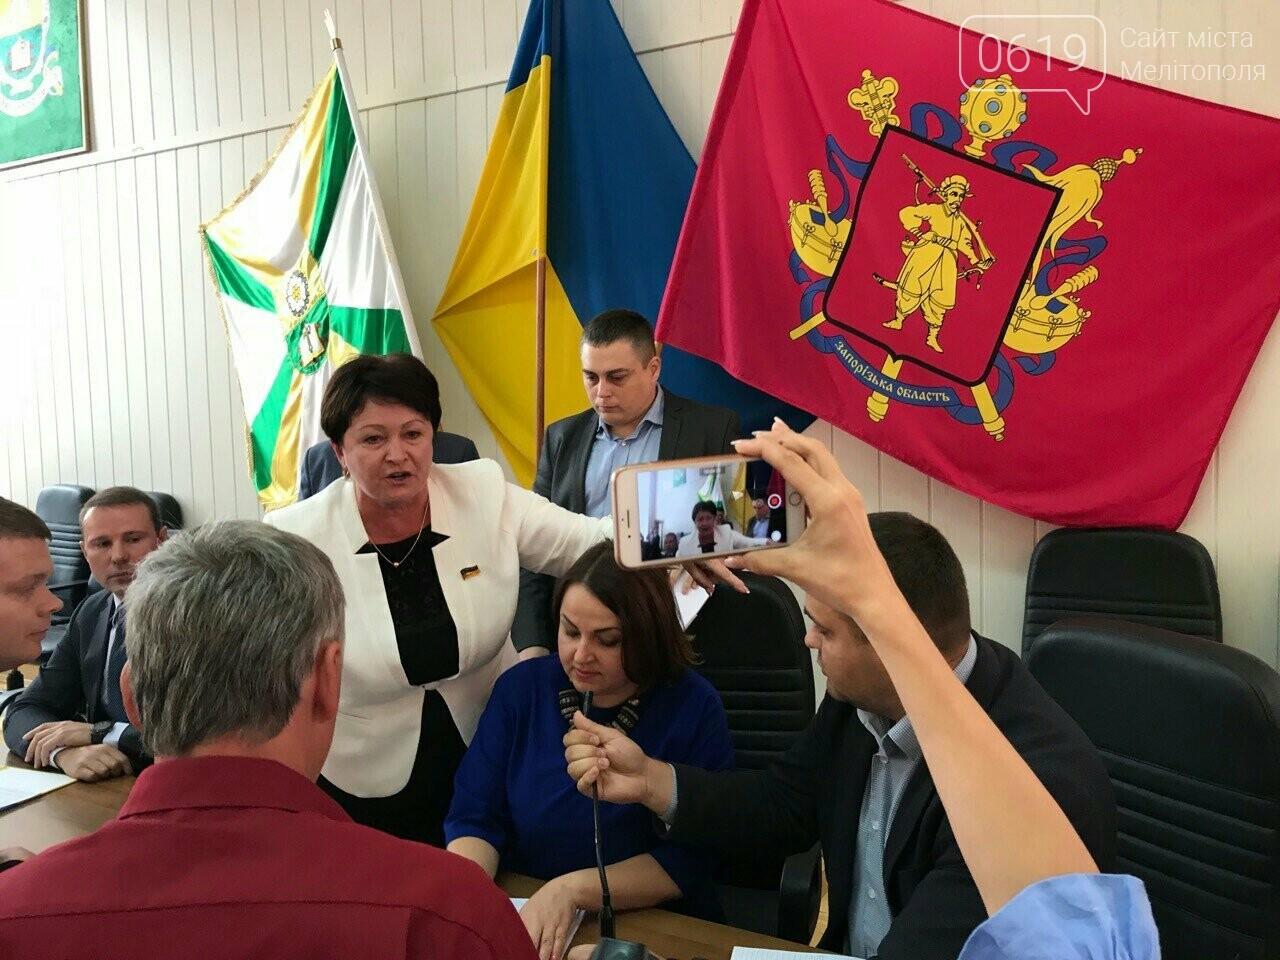 Рупор вместо микрофона: лидер оппоблока устоила акцию протеста и сорвала сессию горсовета, фото-4